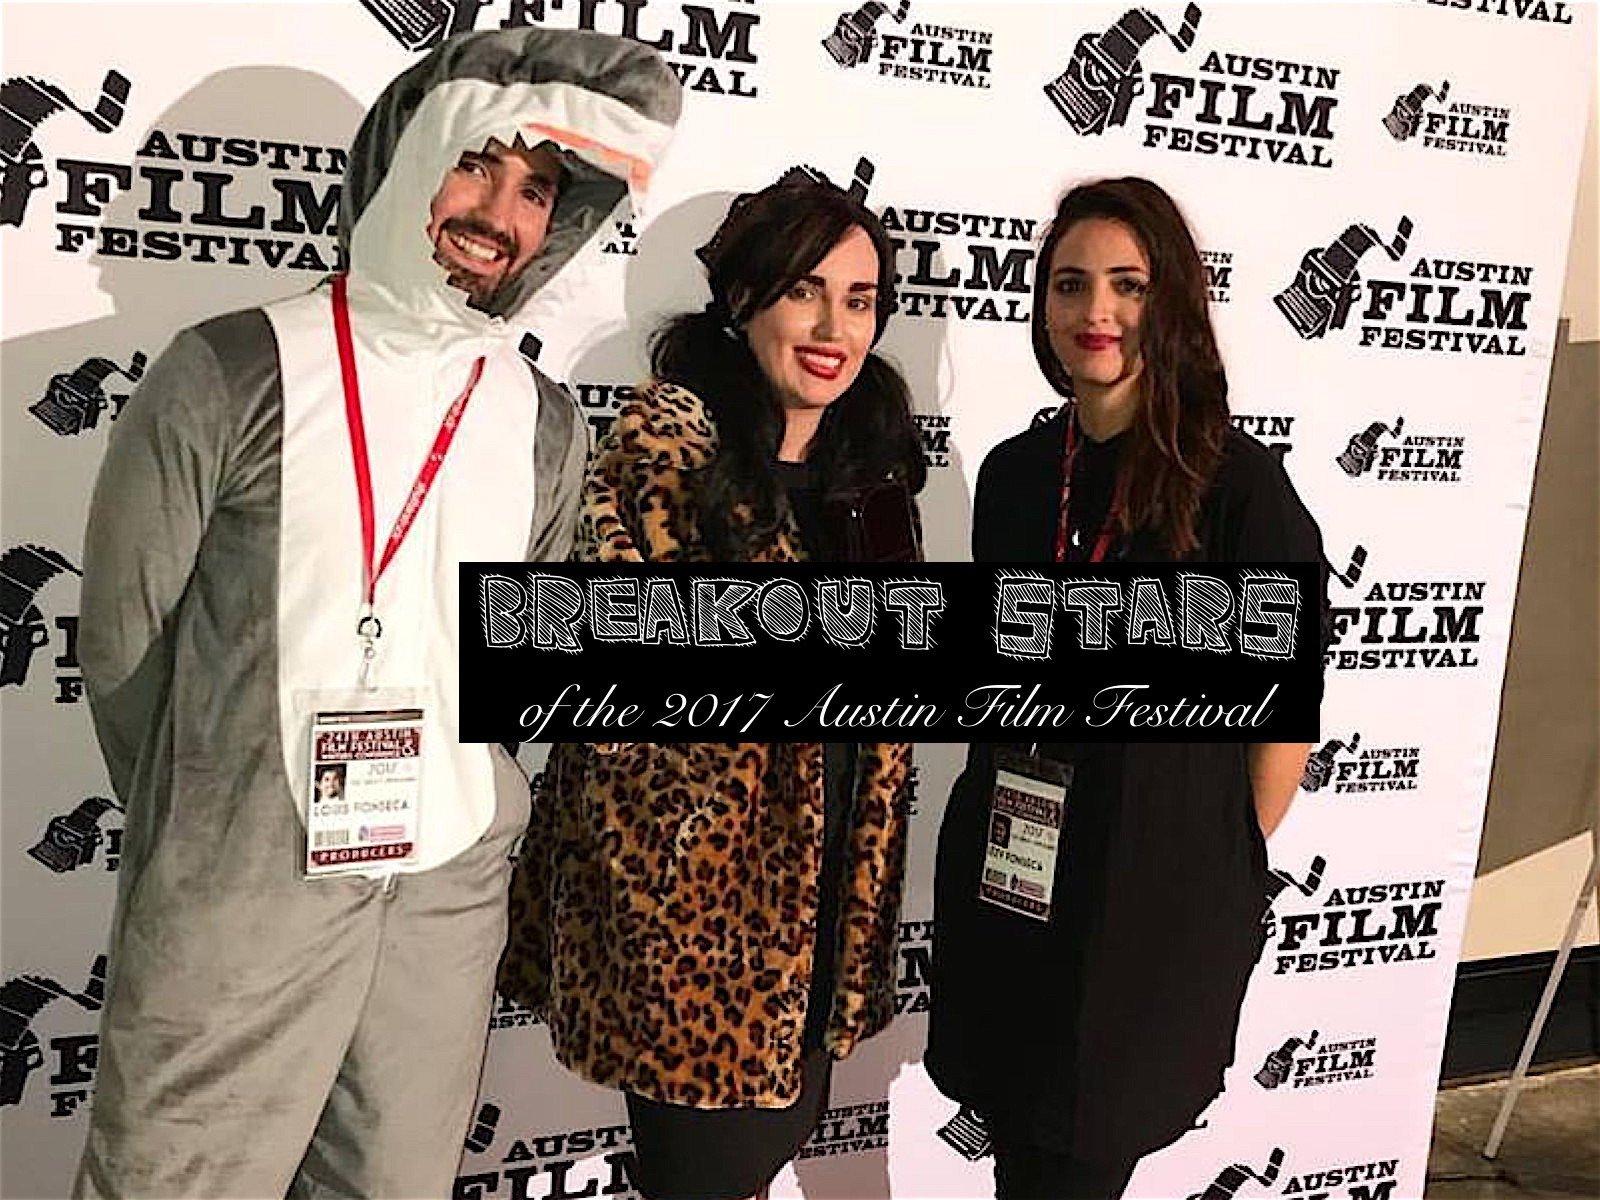 Breakout Stars of the 2017 Austin Film Festival - Season 1